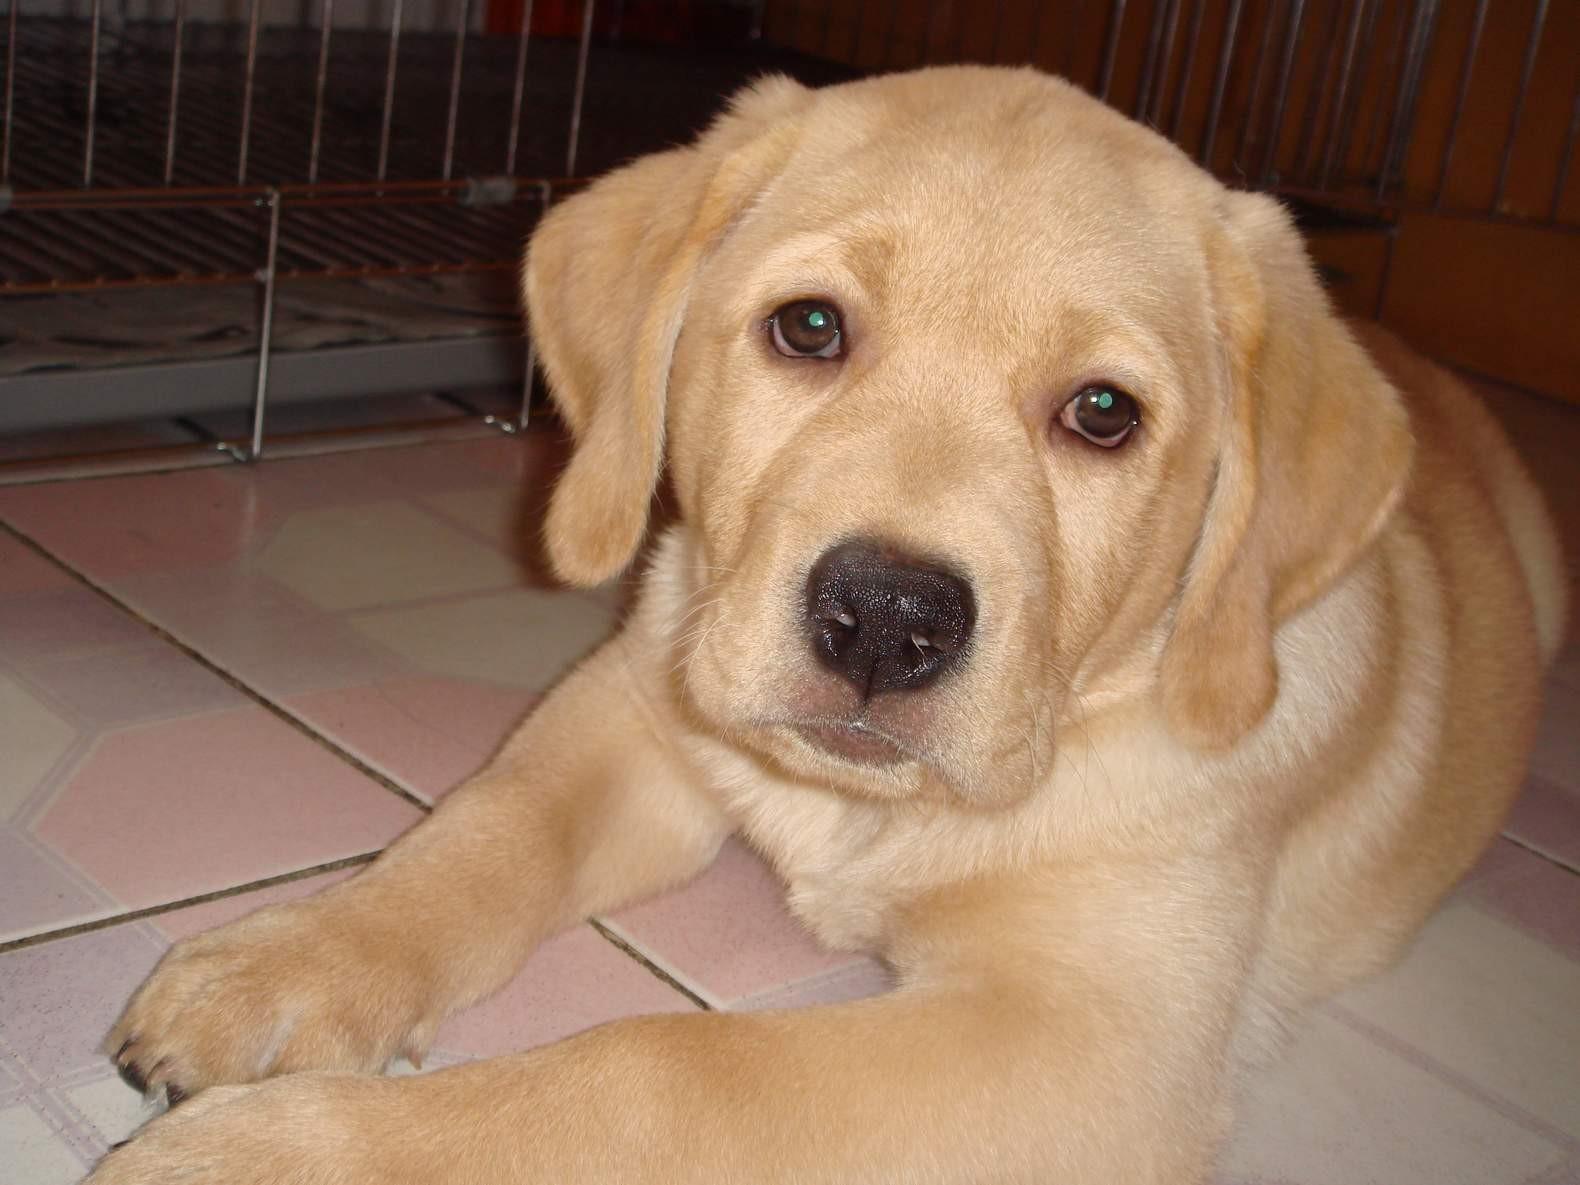 B、成犬:纯狗粮喂养的成犬一般也无需补钙,因为这时期犬只的骨骼及其他器官的生长发育已基本停止,所以对钙质的需求不大,一般在狗粮中就可以得到满足。 C、孕犬:妊娠犬要注意补钙问题,可以恢复到幼犬时期的补钙剂量,并应当保持适当的运动。购买孕犬狗粮就是很好的选择。 生产10天后的狗妈妈容易发生缺钙,因为乳汁分泌的增加会加快其体内钙质的流失,血钙浓度过低会引起急性产后缺钙,严重的会造成肌无力、昏迷甚至死亡。出现这情况要马上送其去医院静脉补钙,同时给幼崽部分人工喂奶,减轻狗妈妈缺钙的负担。 D、老年犬:随着年龄的